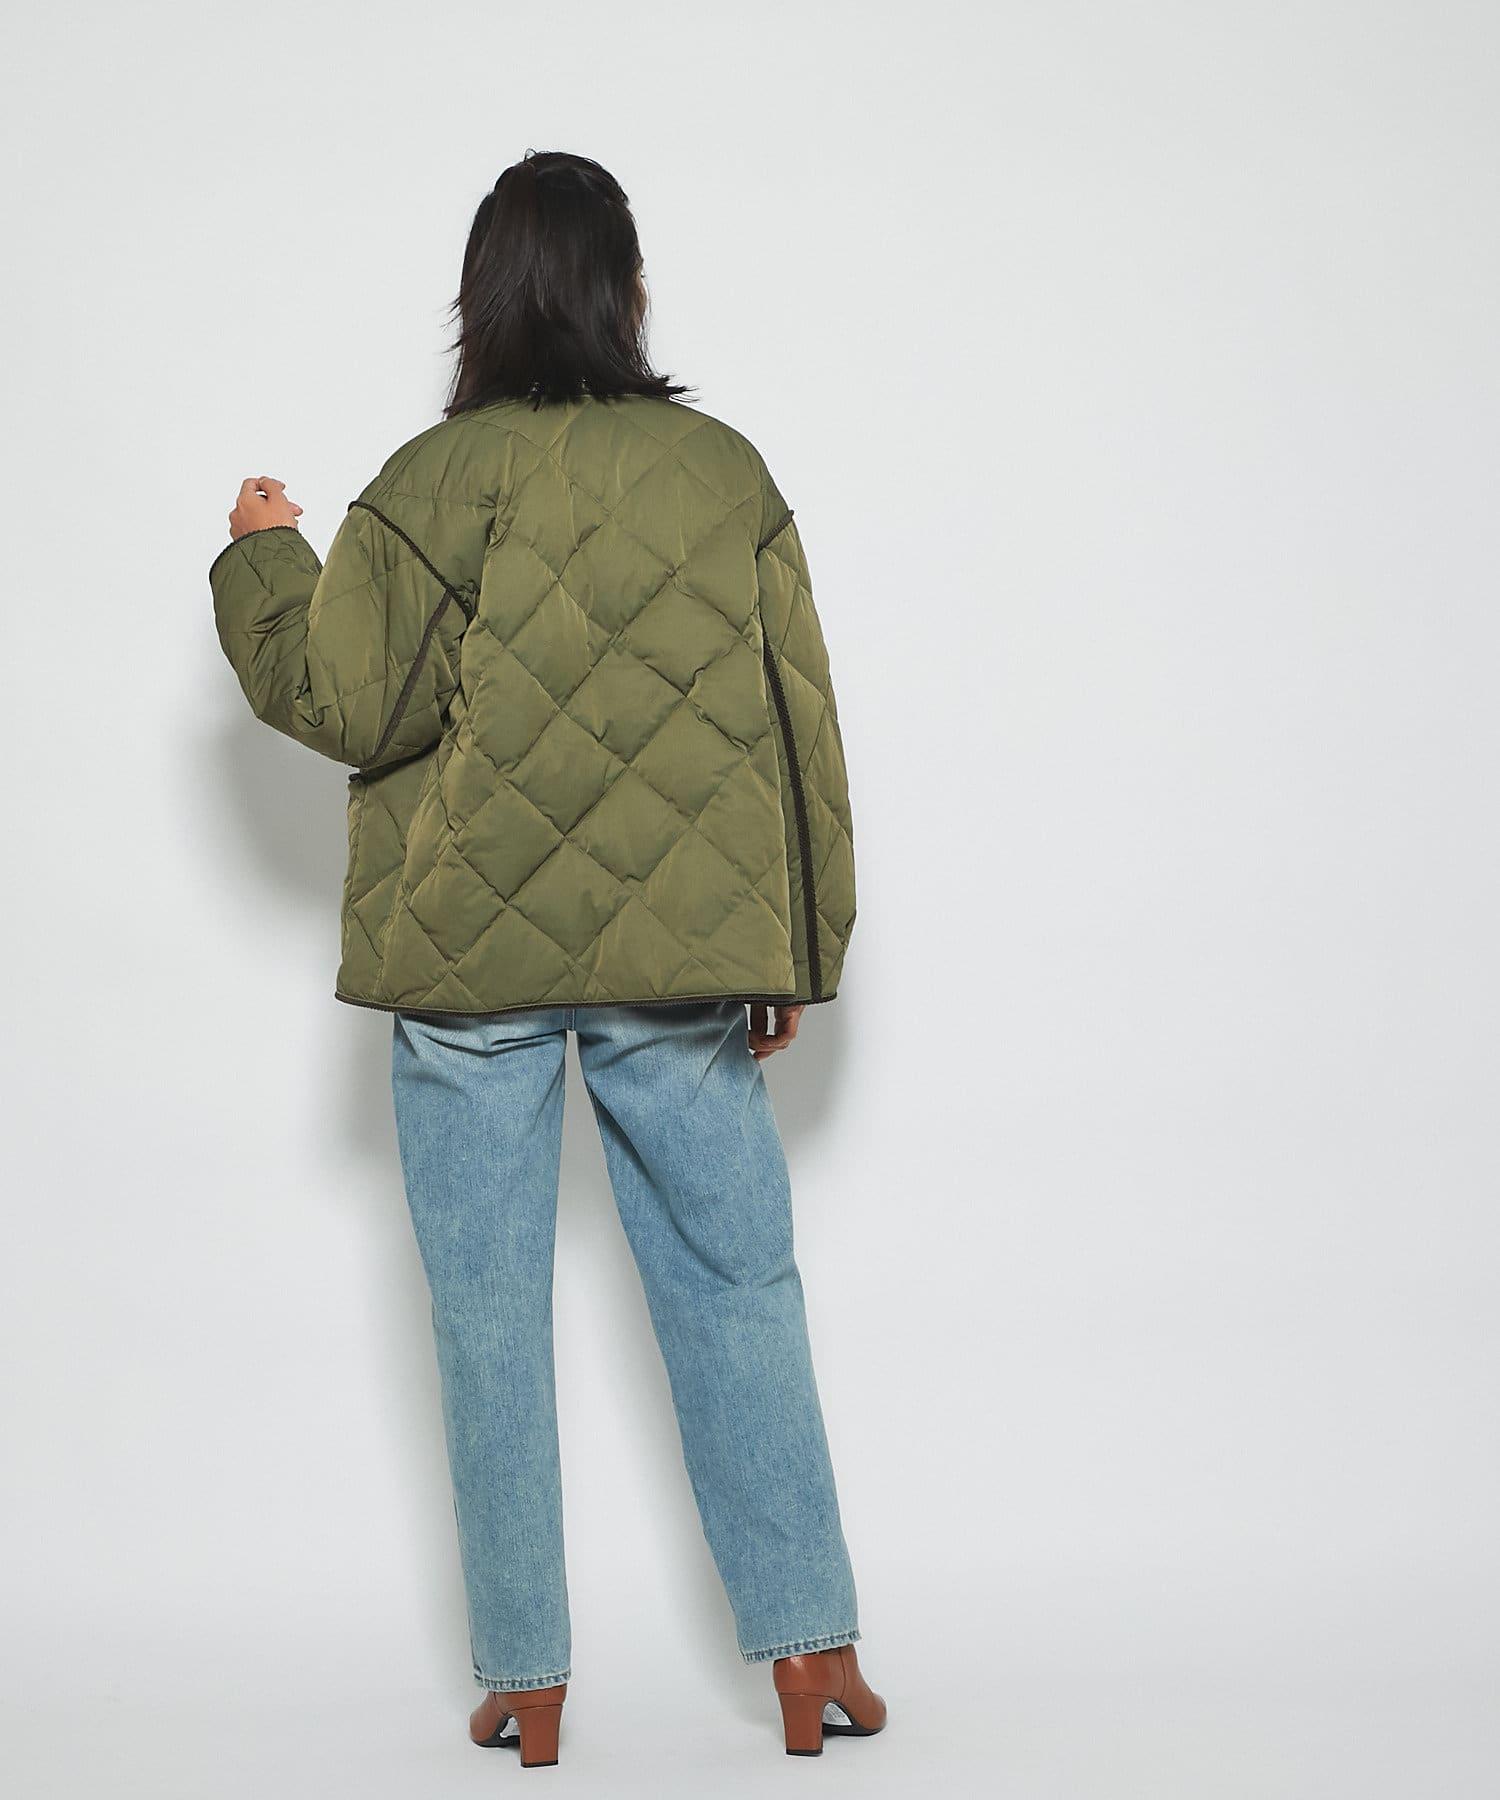 RIVE DROITE(リヴドロワ) 【羽織るだけでいつものスタイリングが新鮮に】キルティングジャケット